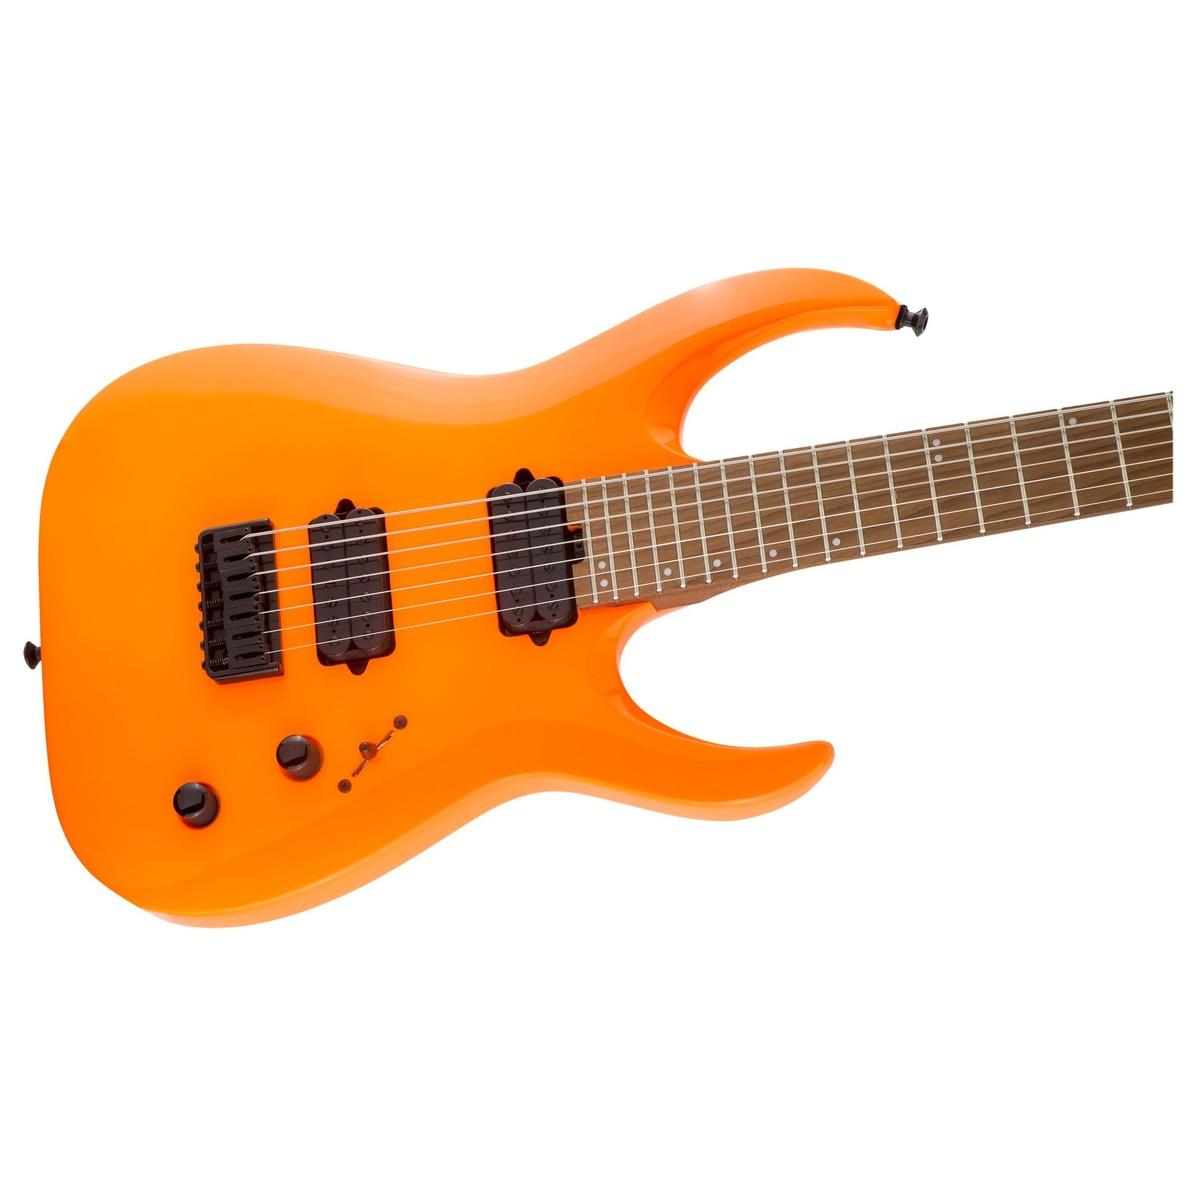 jackson pro misha mansoor juggernaut ht 7 neon orange at gear4music. Black Bedroom Furniture Sets. Home Design Ideas